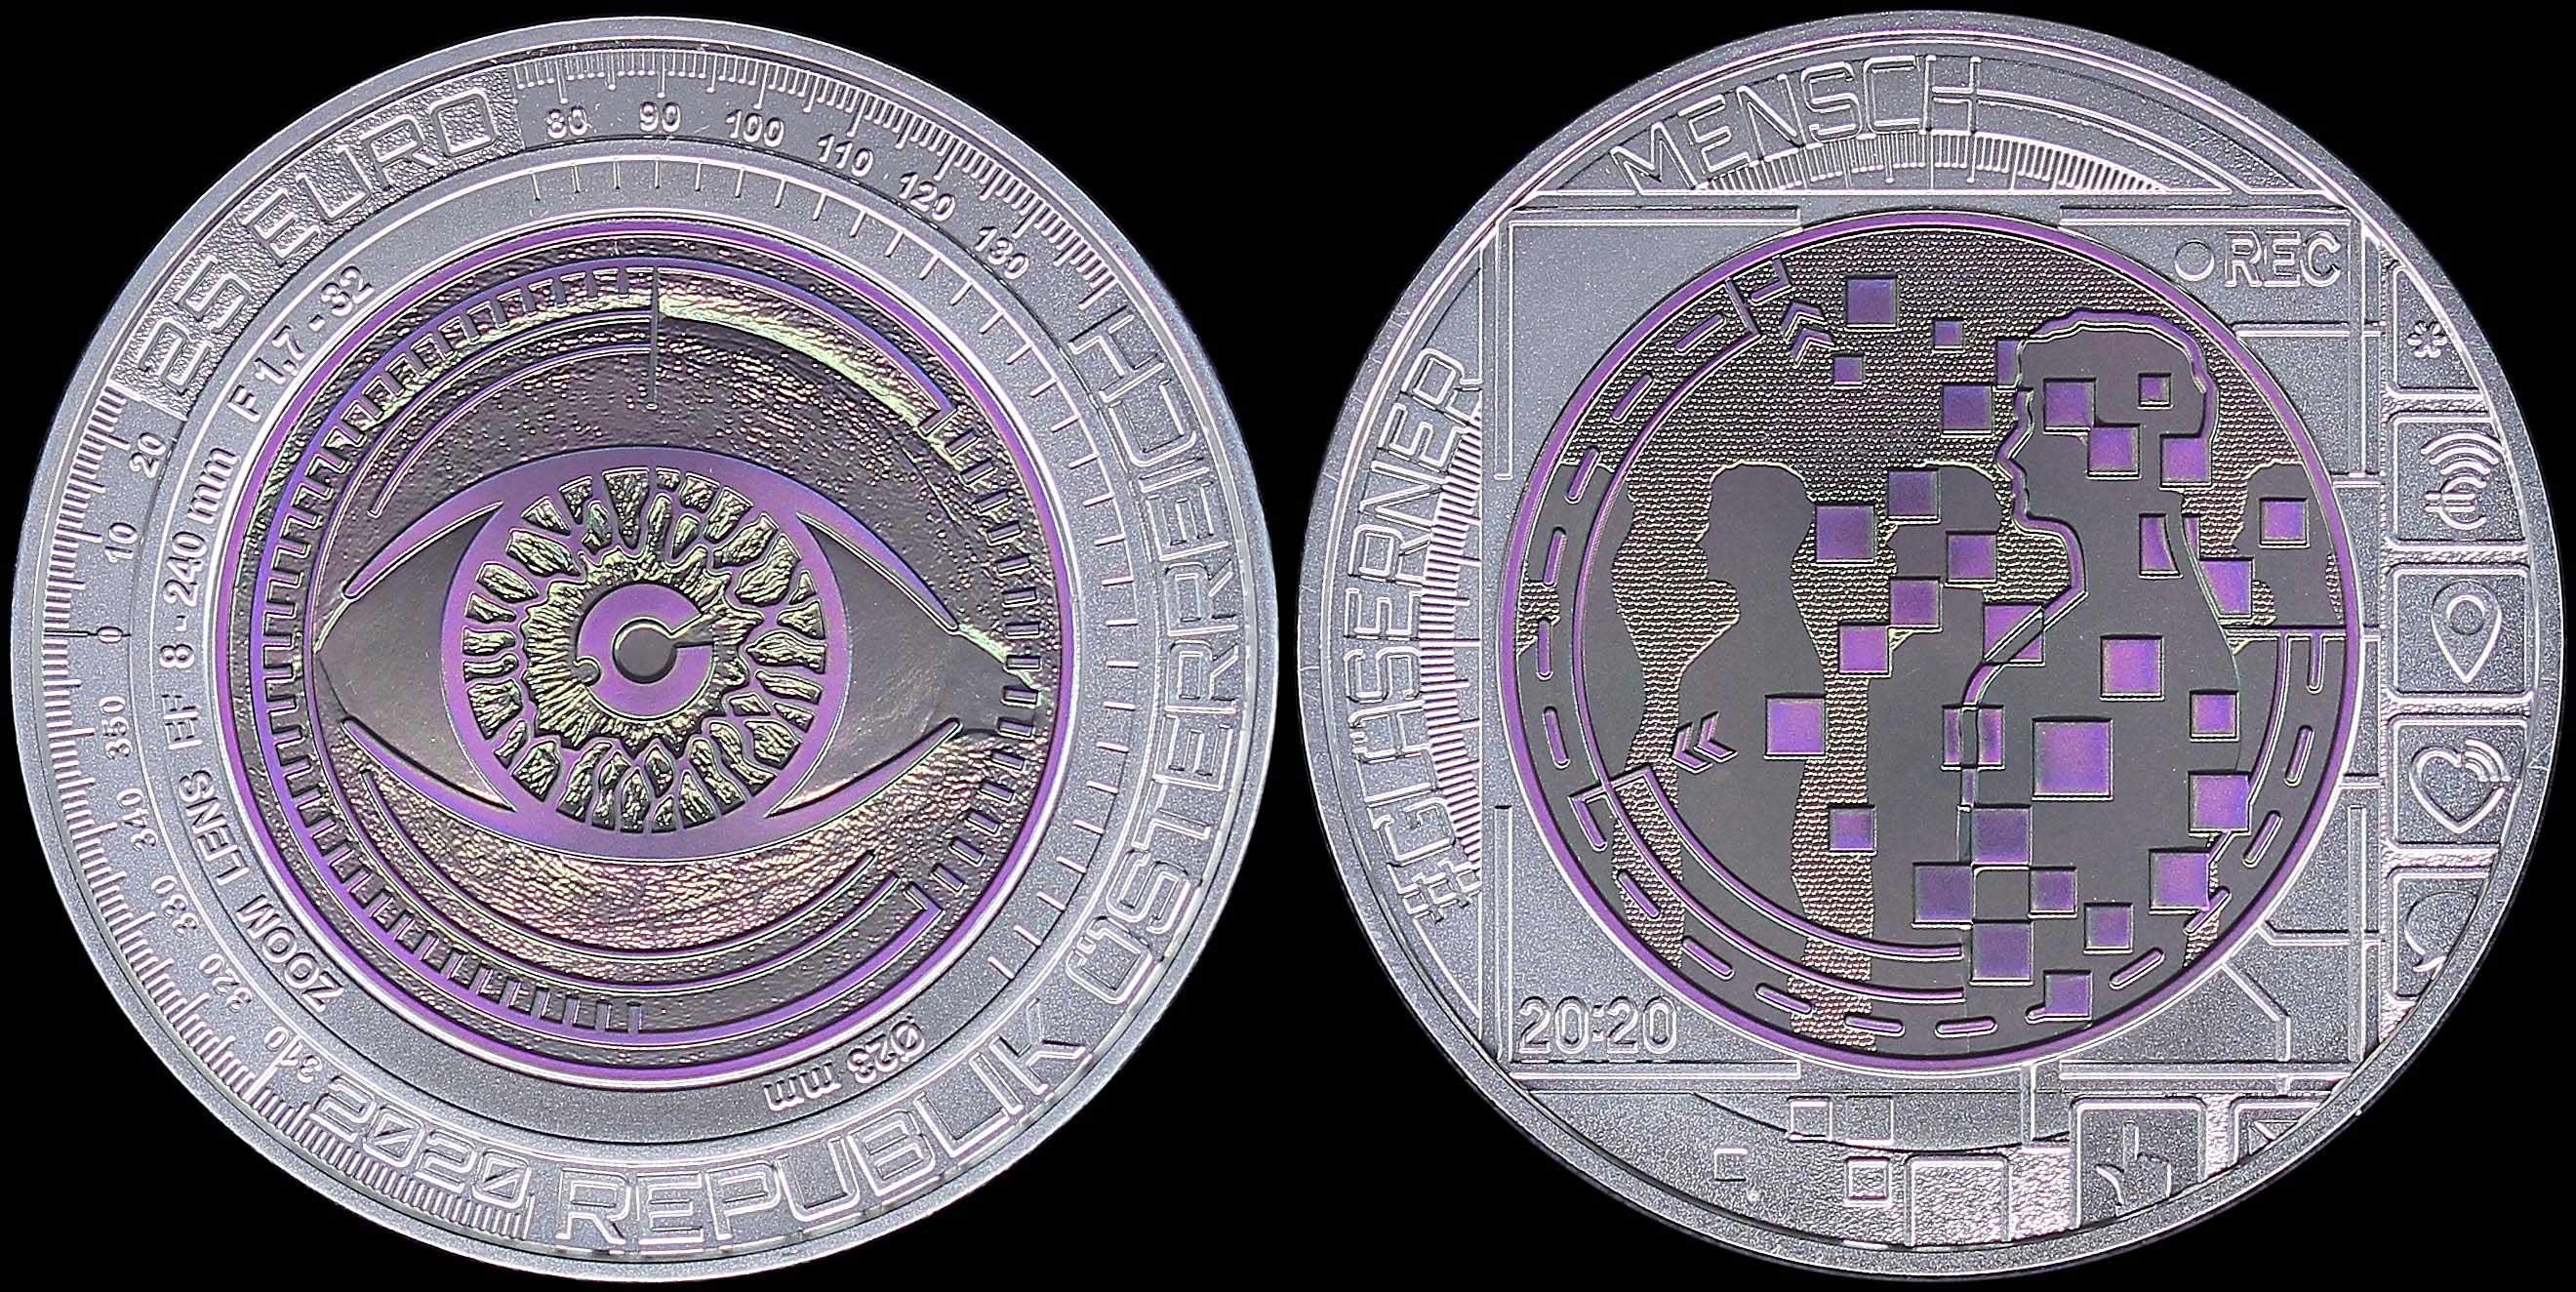 Lot 6796 - -  COINS & TOKENS COINS & TOKENS OF EUROPEAN COUNTRIES -  A. Karamitsos Postal & Live Internet Auction 984 (Part B)